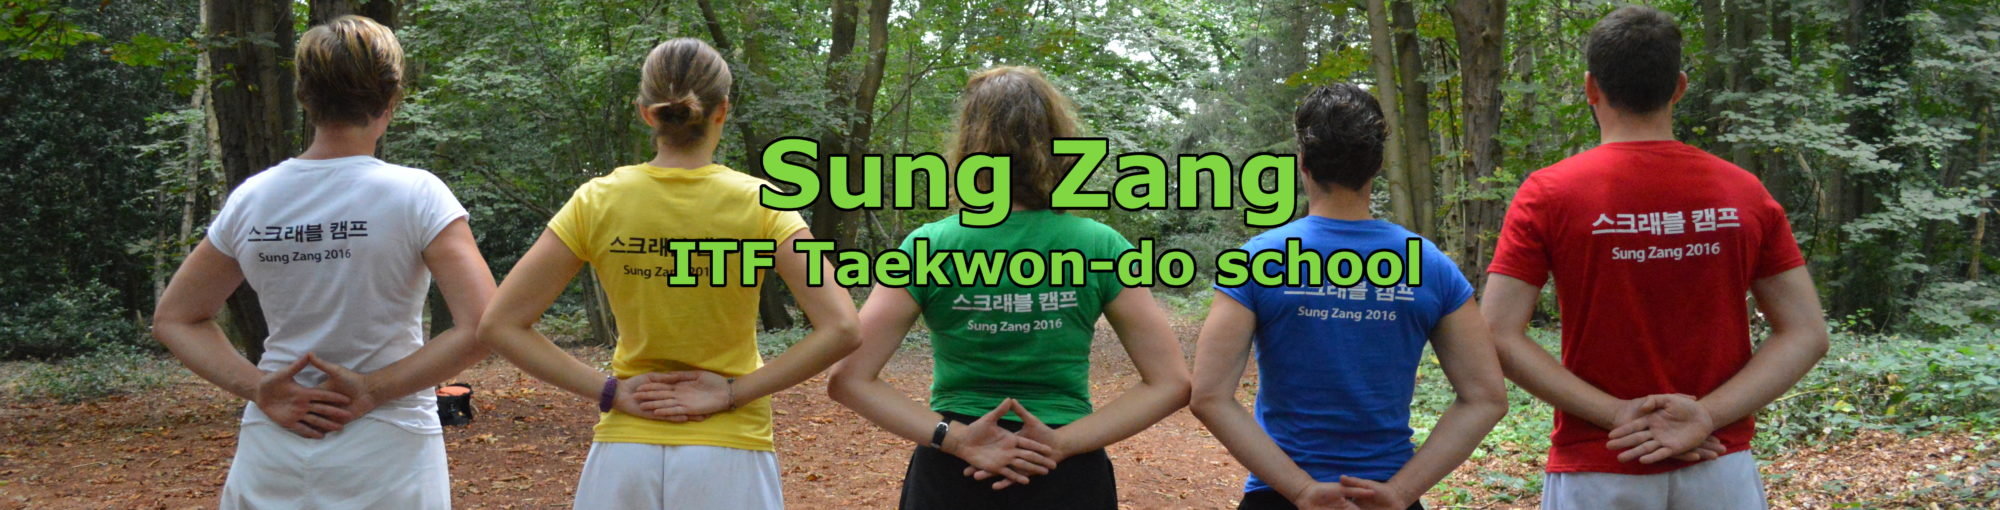 Sung Zang